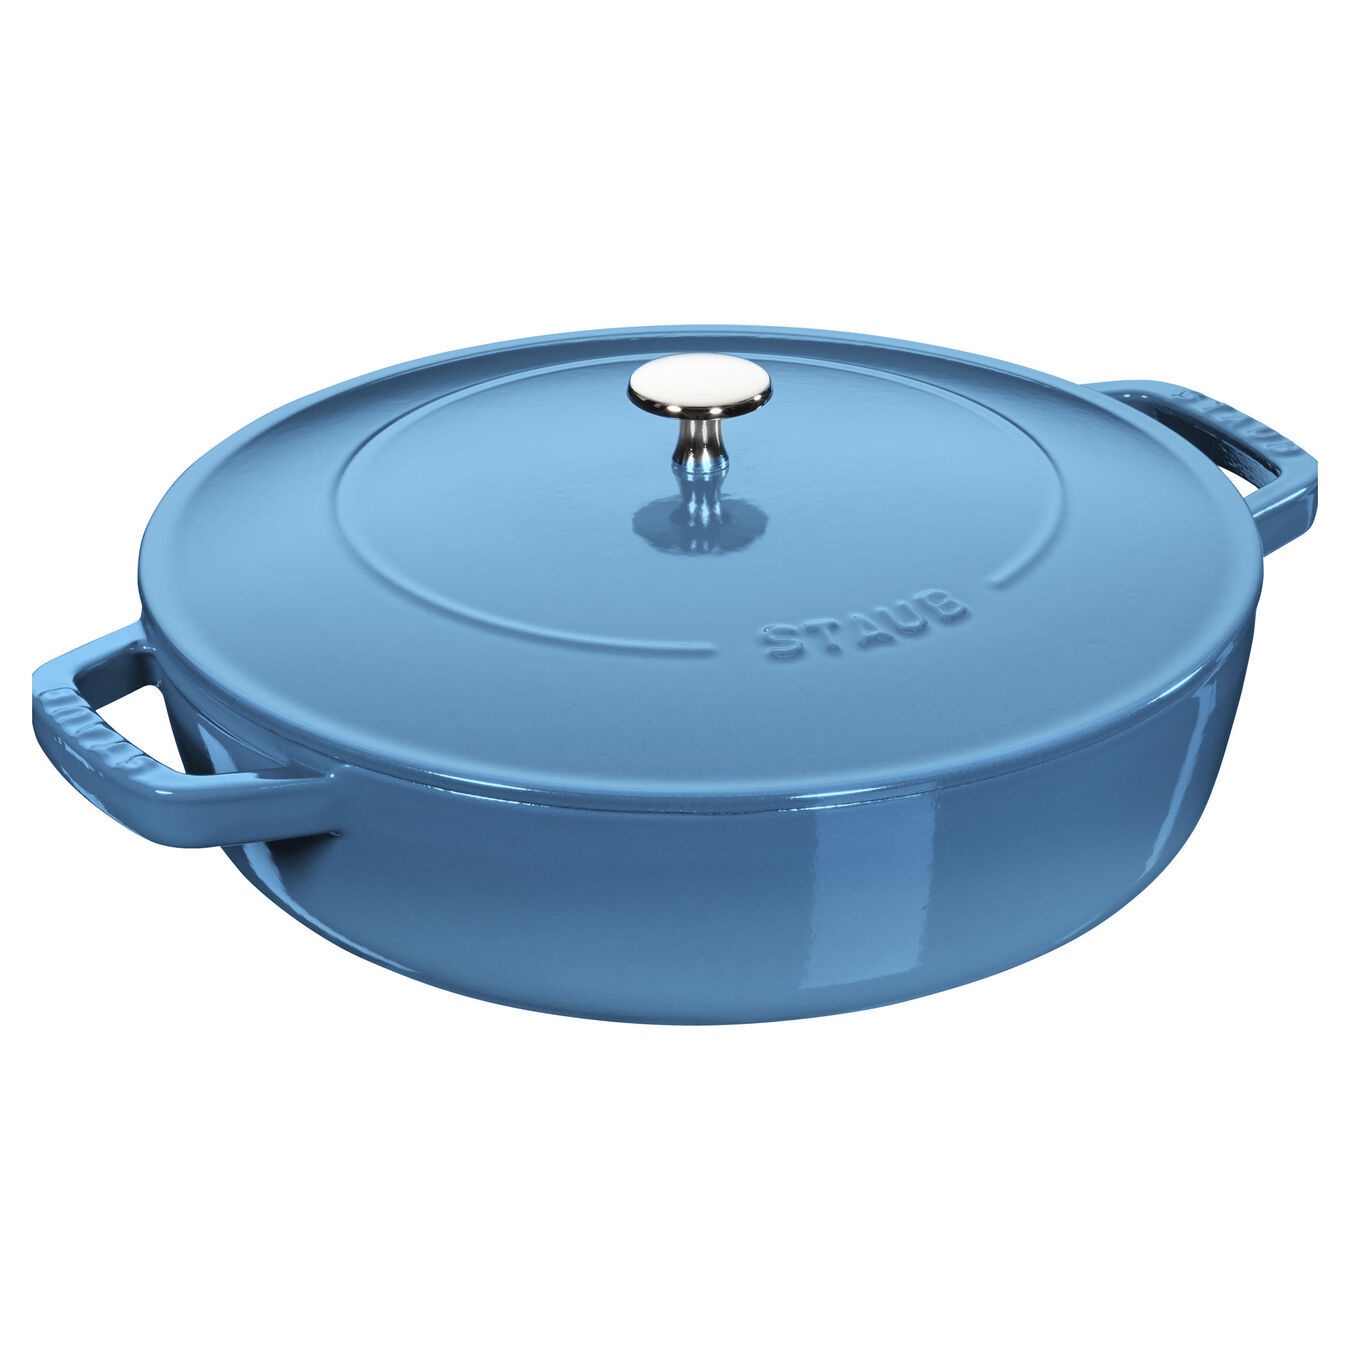 3.75 l round Saute pan Chistera, ice-blue,,large 2